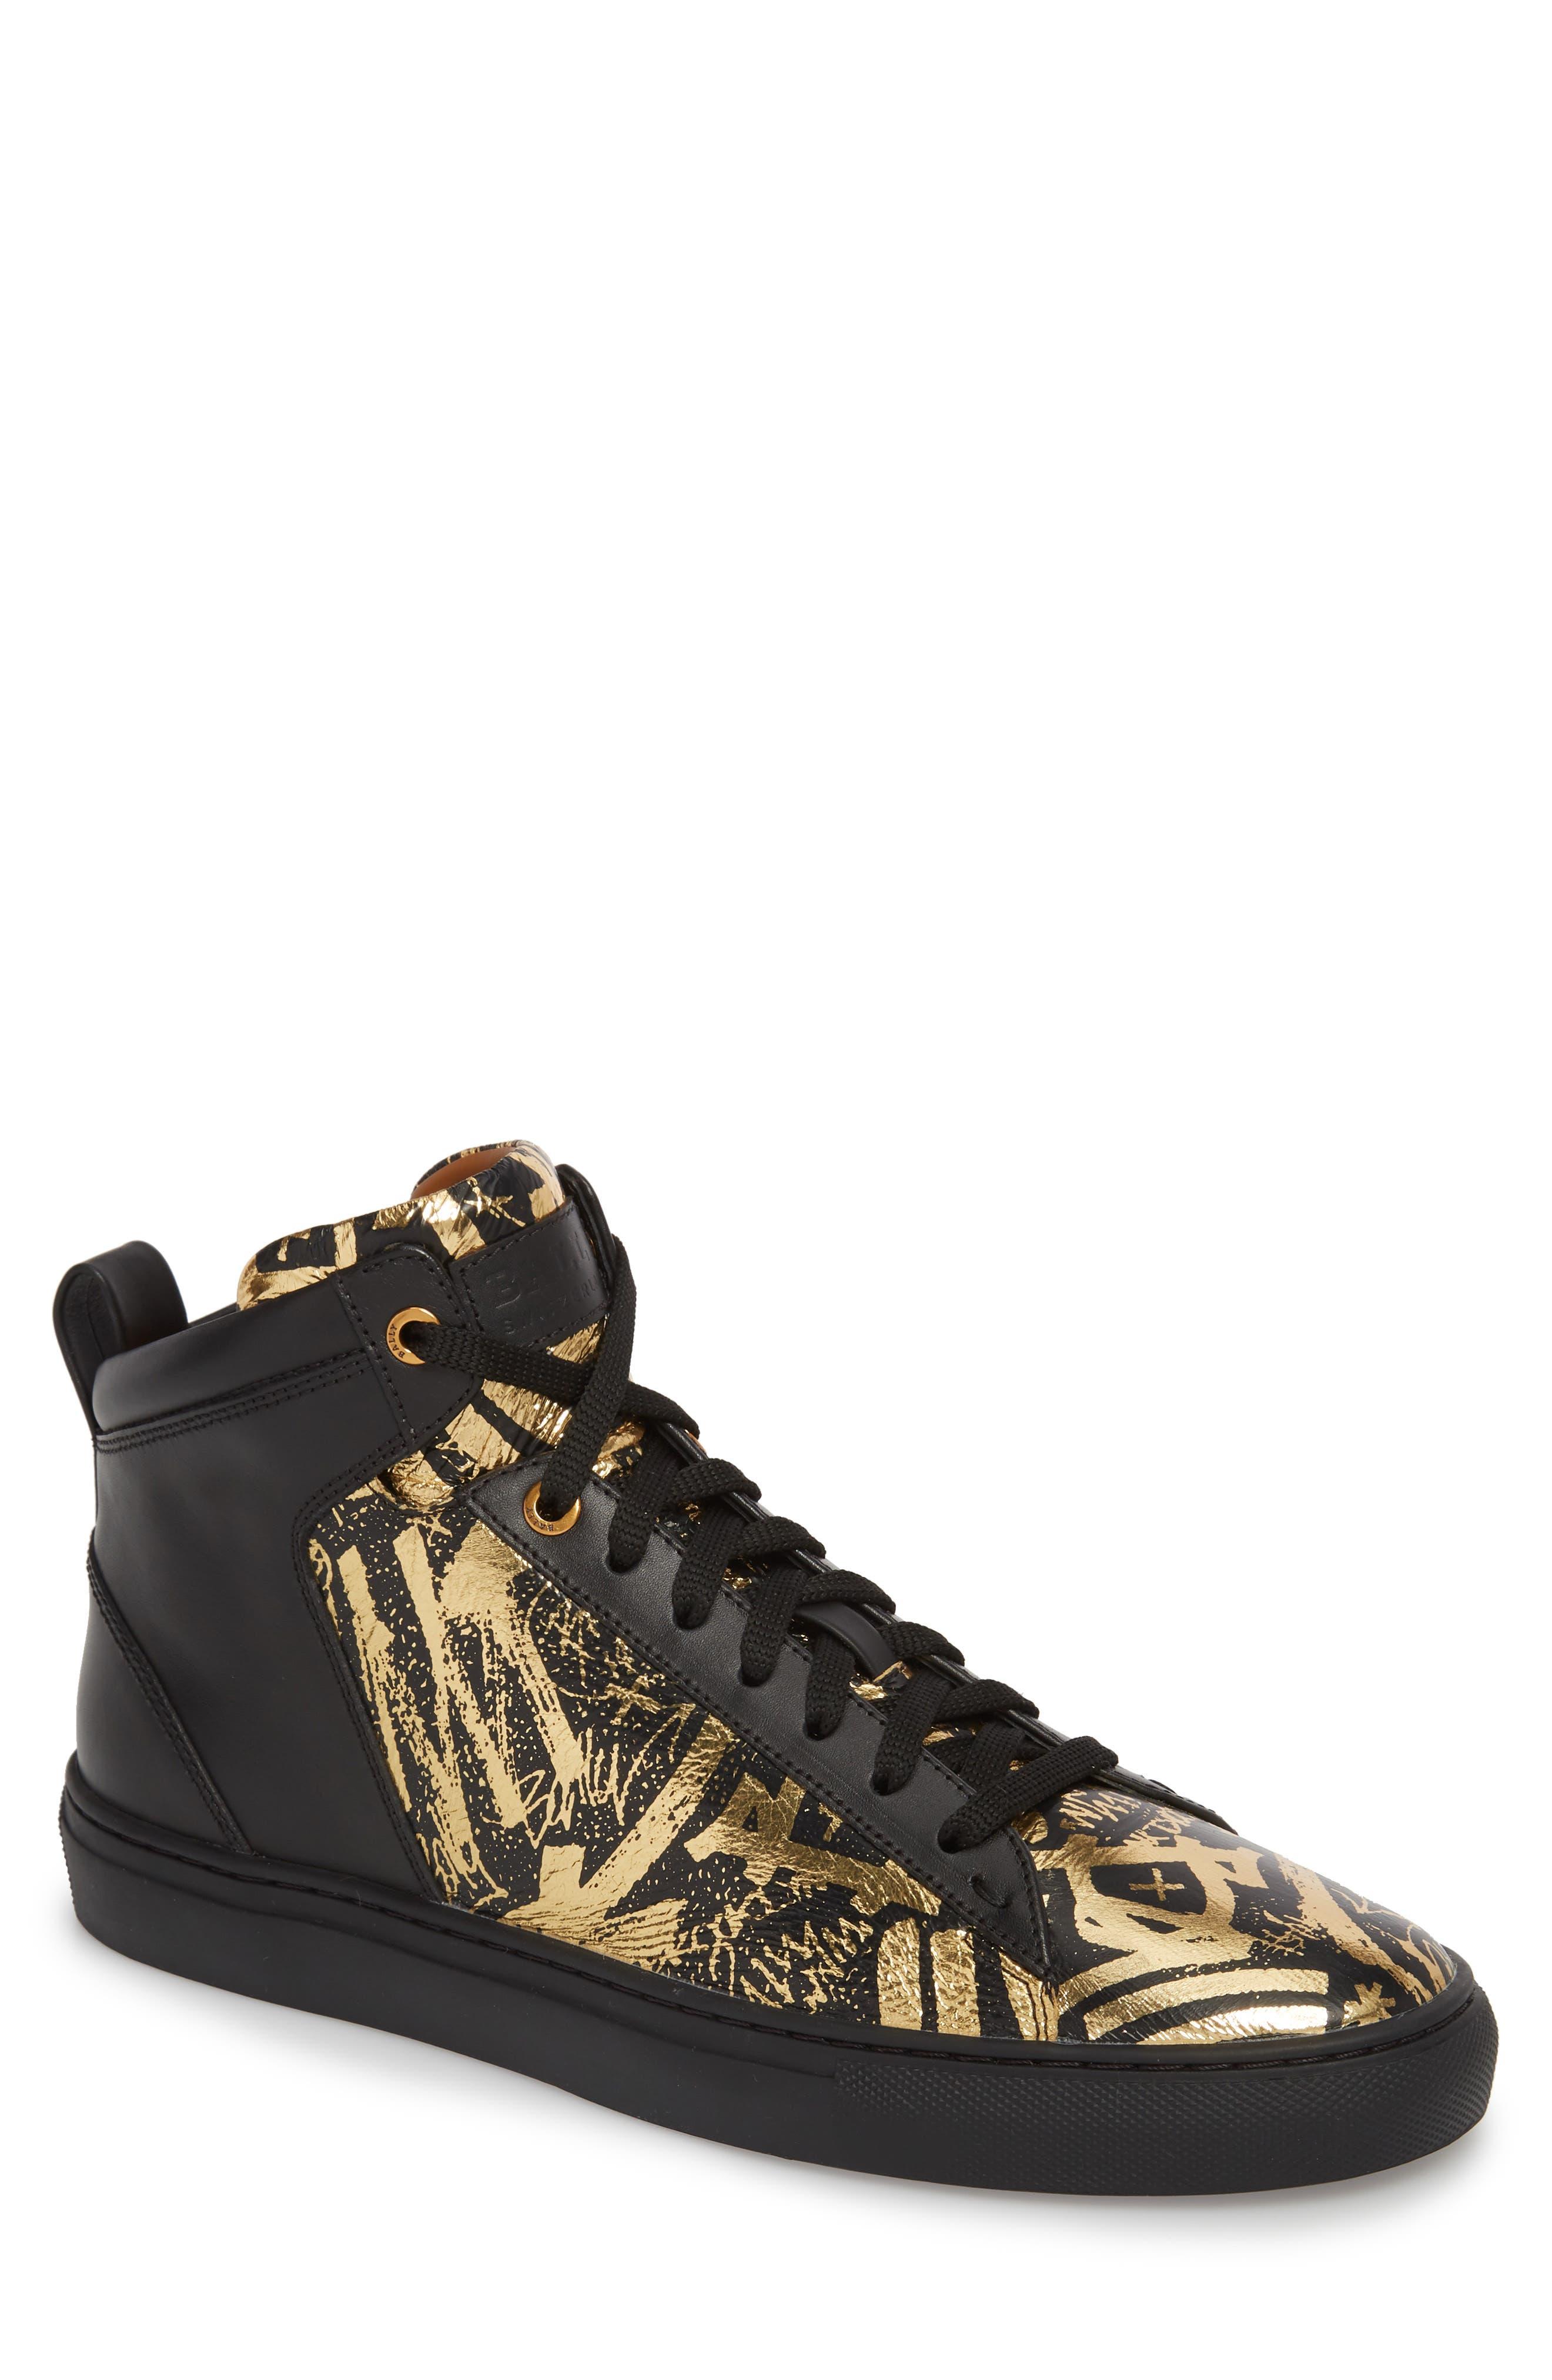 Hedo High Top Sneaker,                             Main thumbnail 1, color,                             GOLD